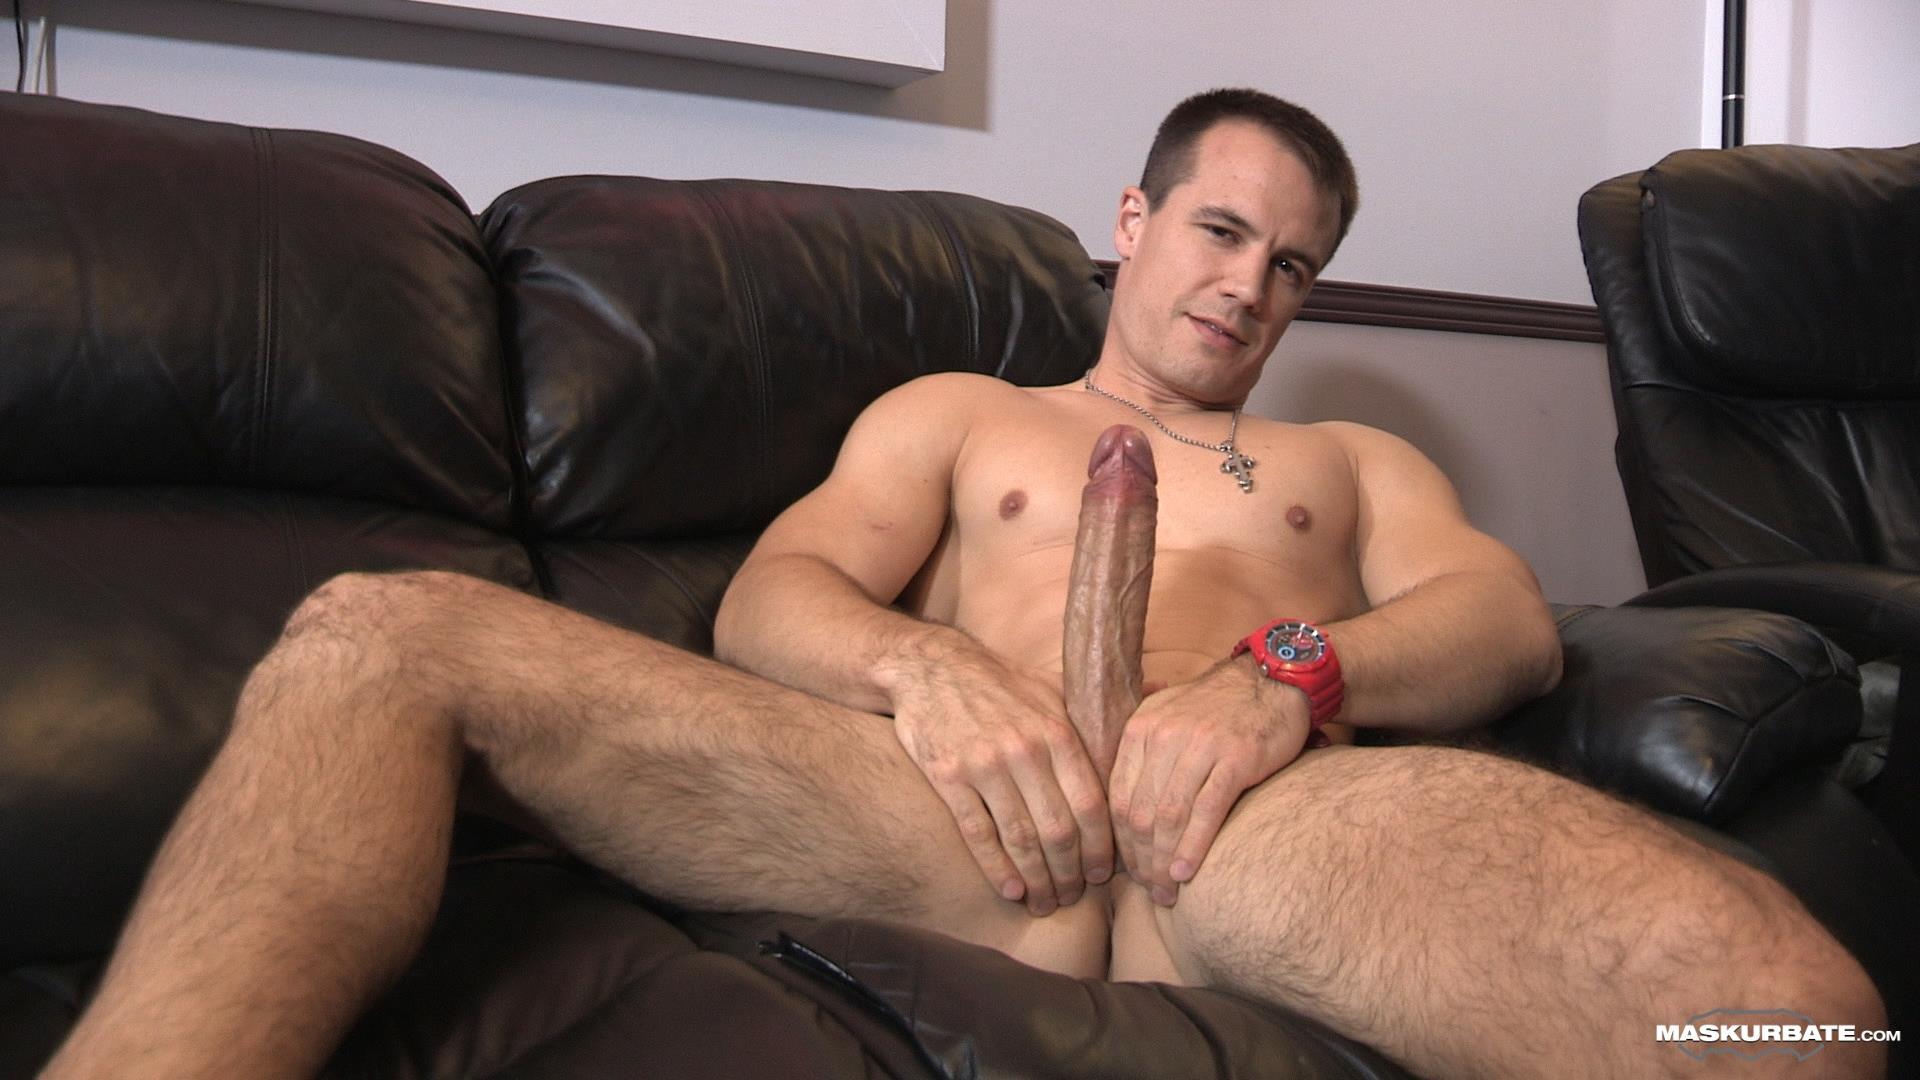 Alessandra Ddd Porn free long gay masturbation tubes - xxx sex photos. comments: 1